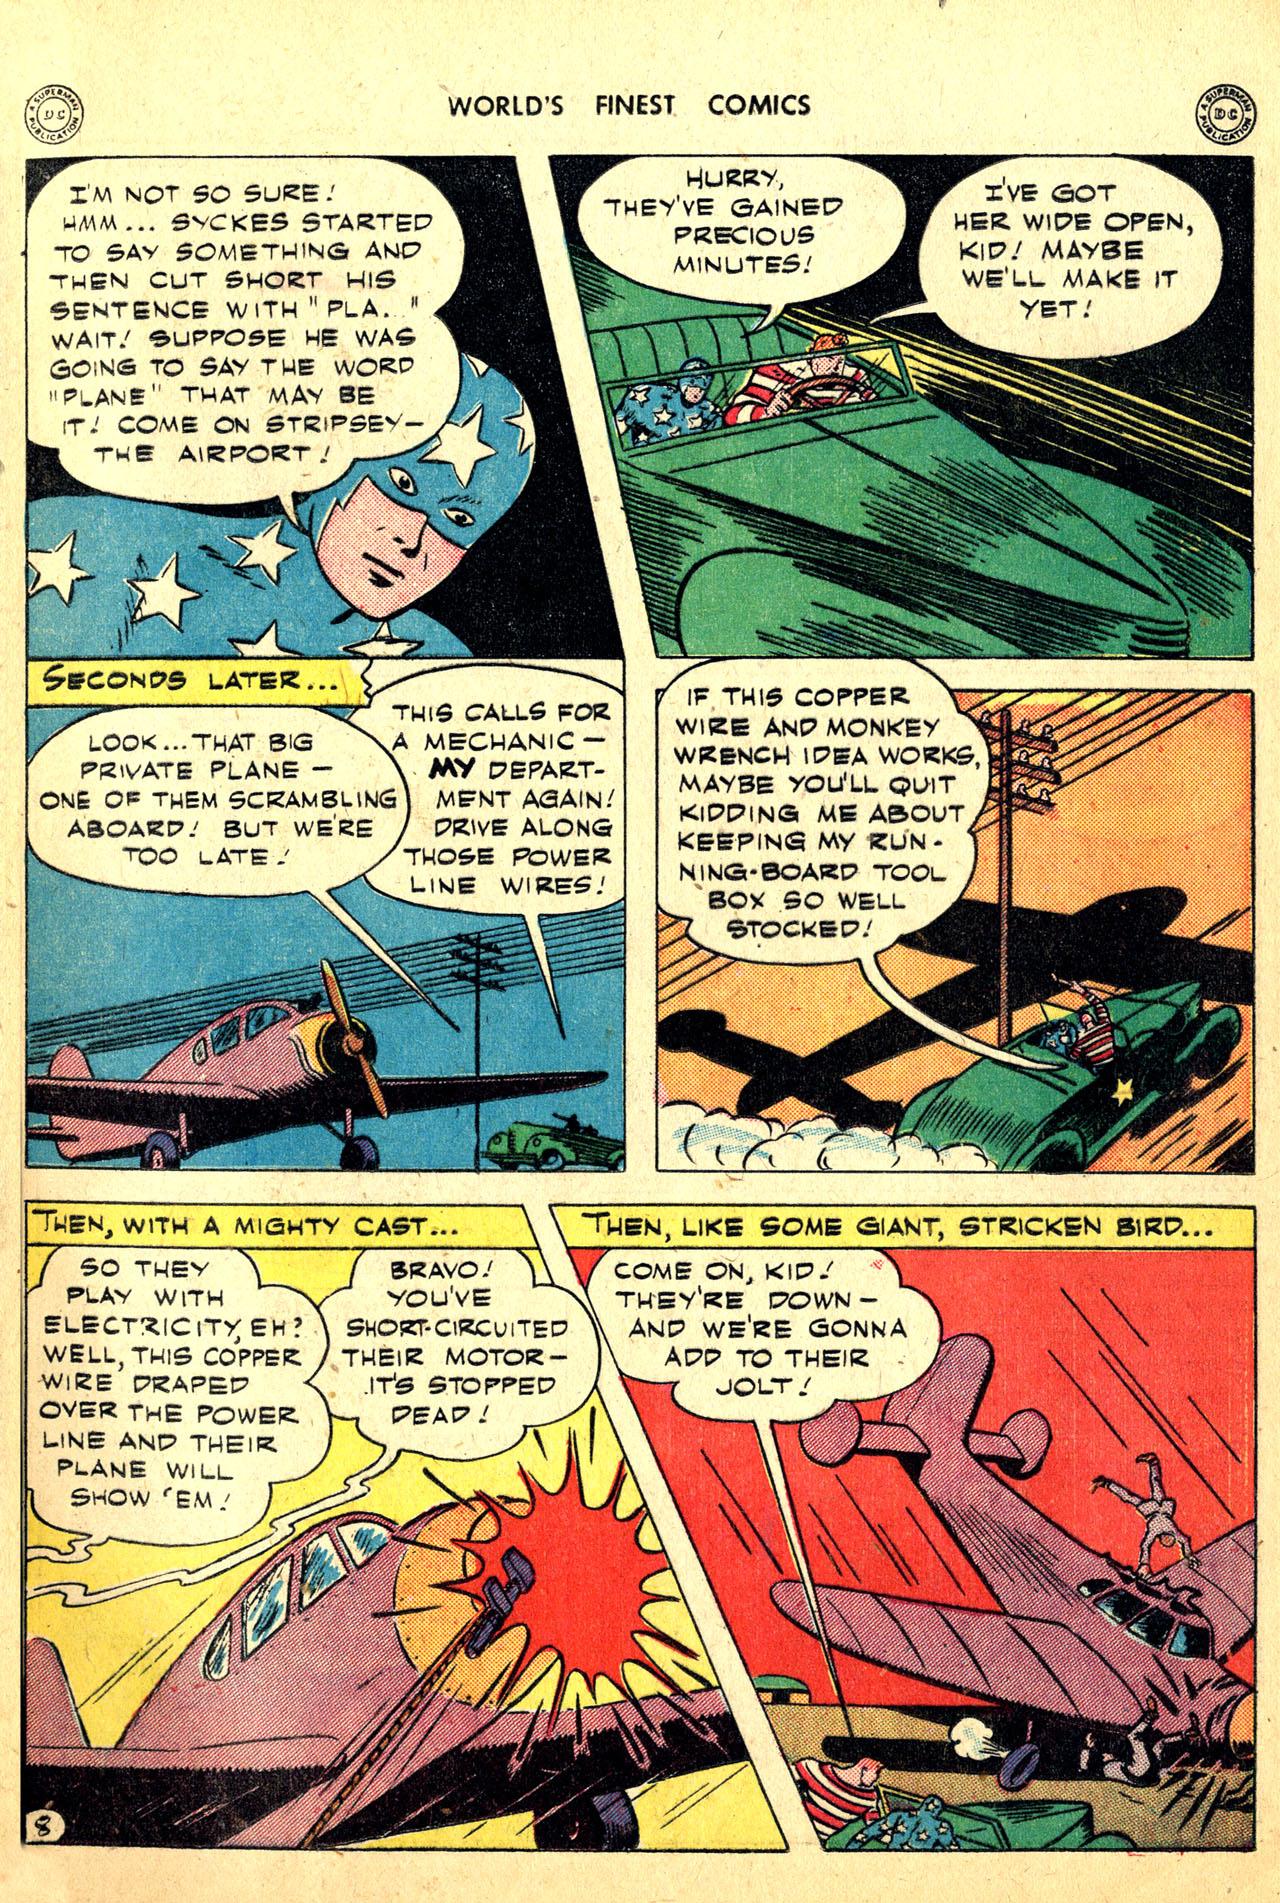 Read online World's Finest Comics comic -  Issue #18 - 23